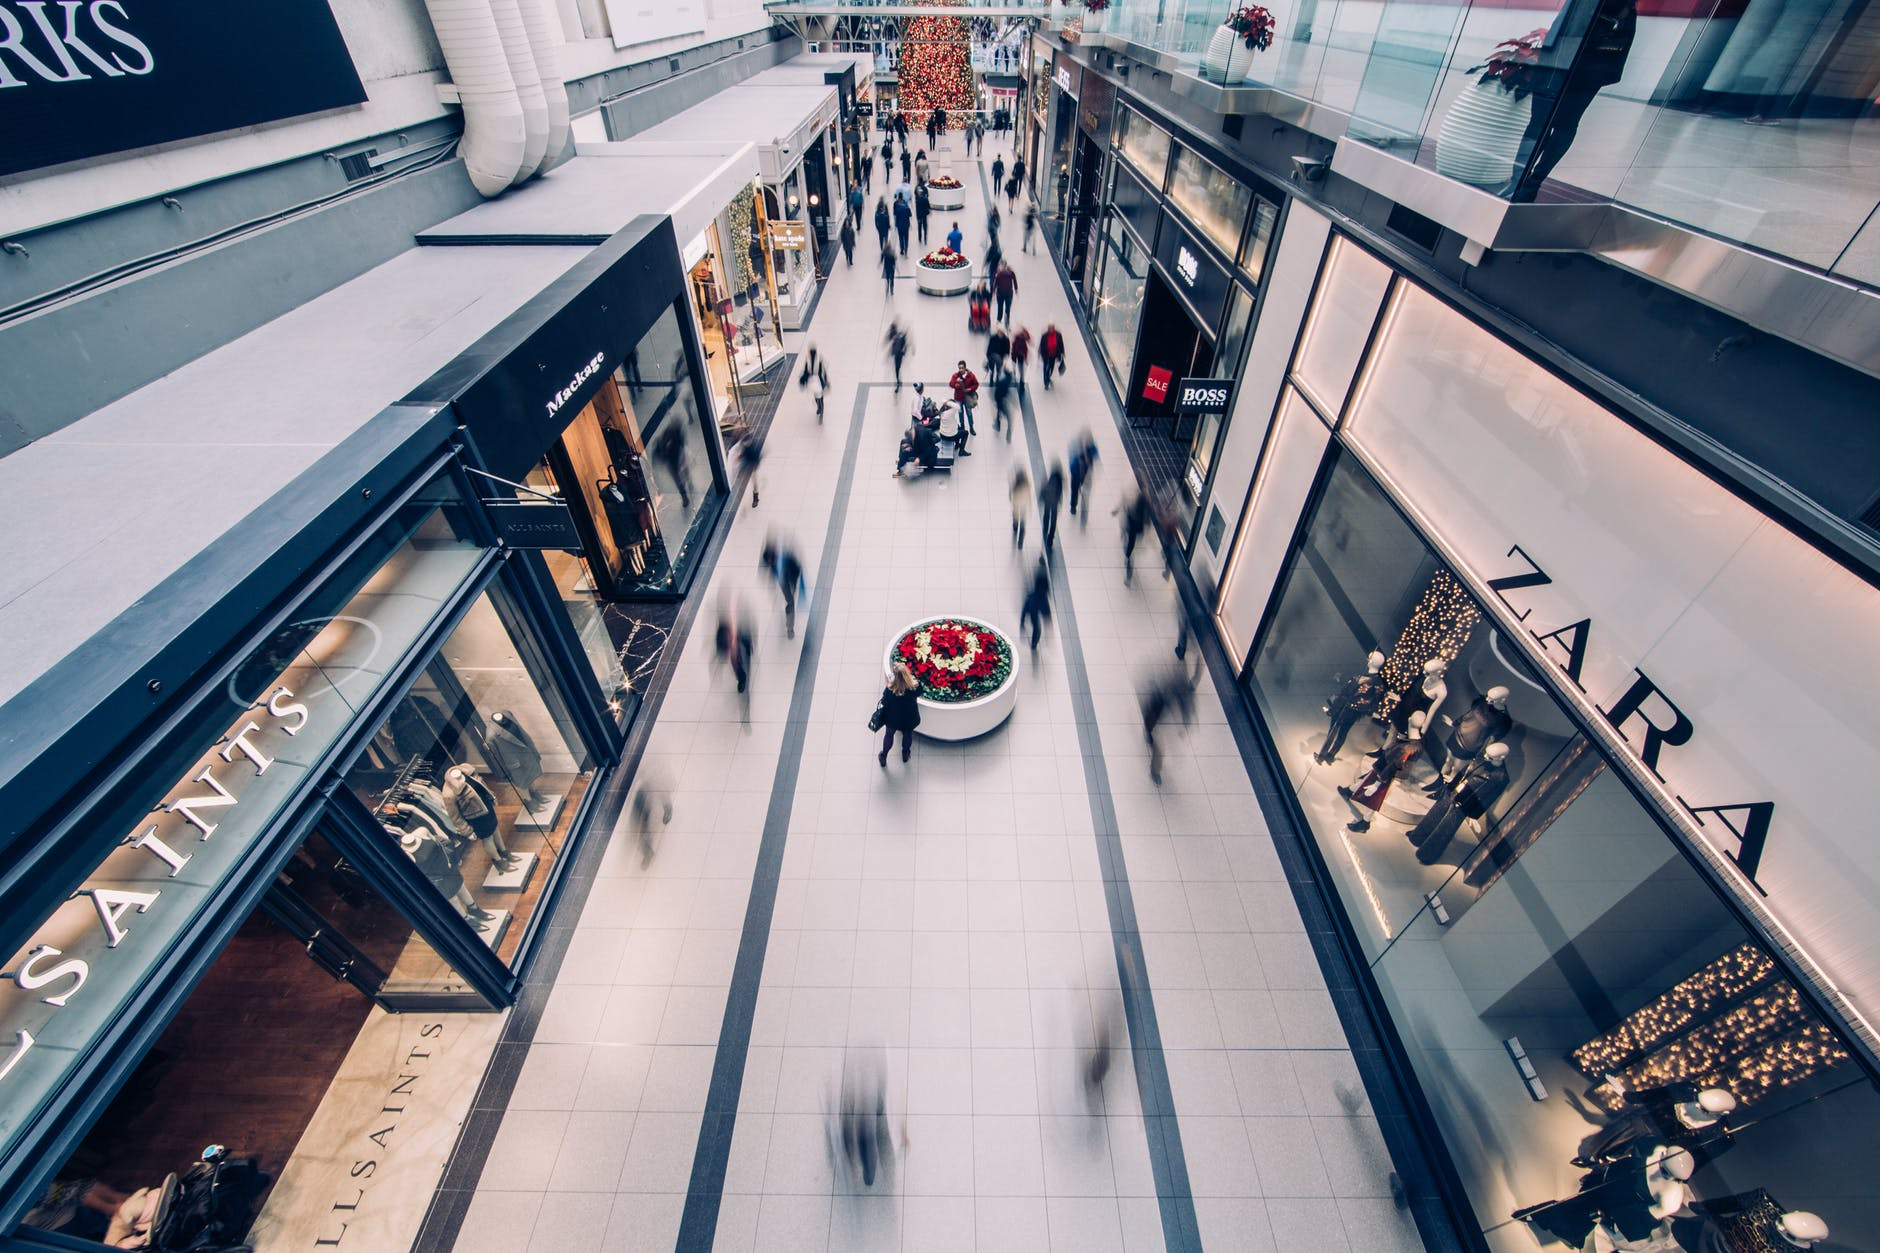 Green Street 2017美国零售地产报告:关店速度创新高,购物中心出租情况两极分化